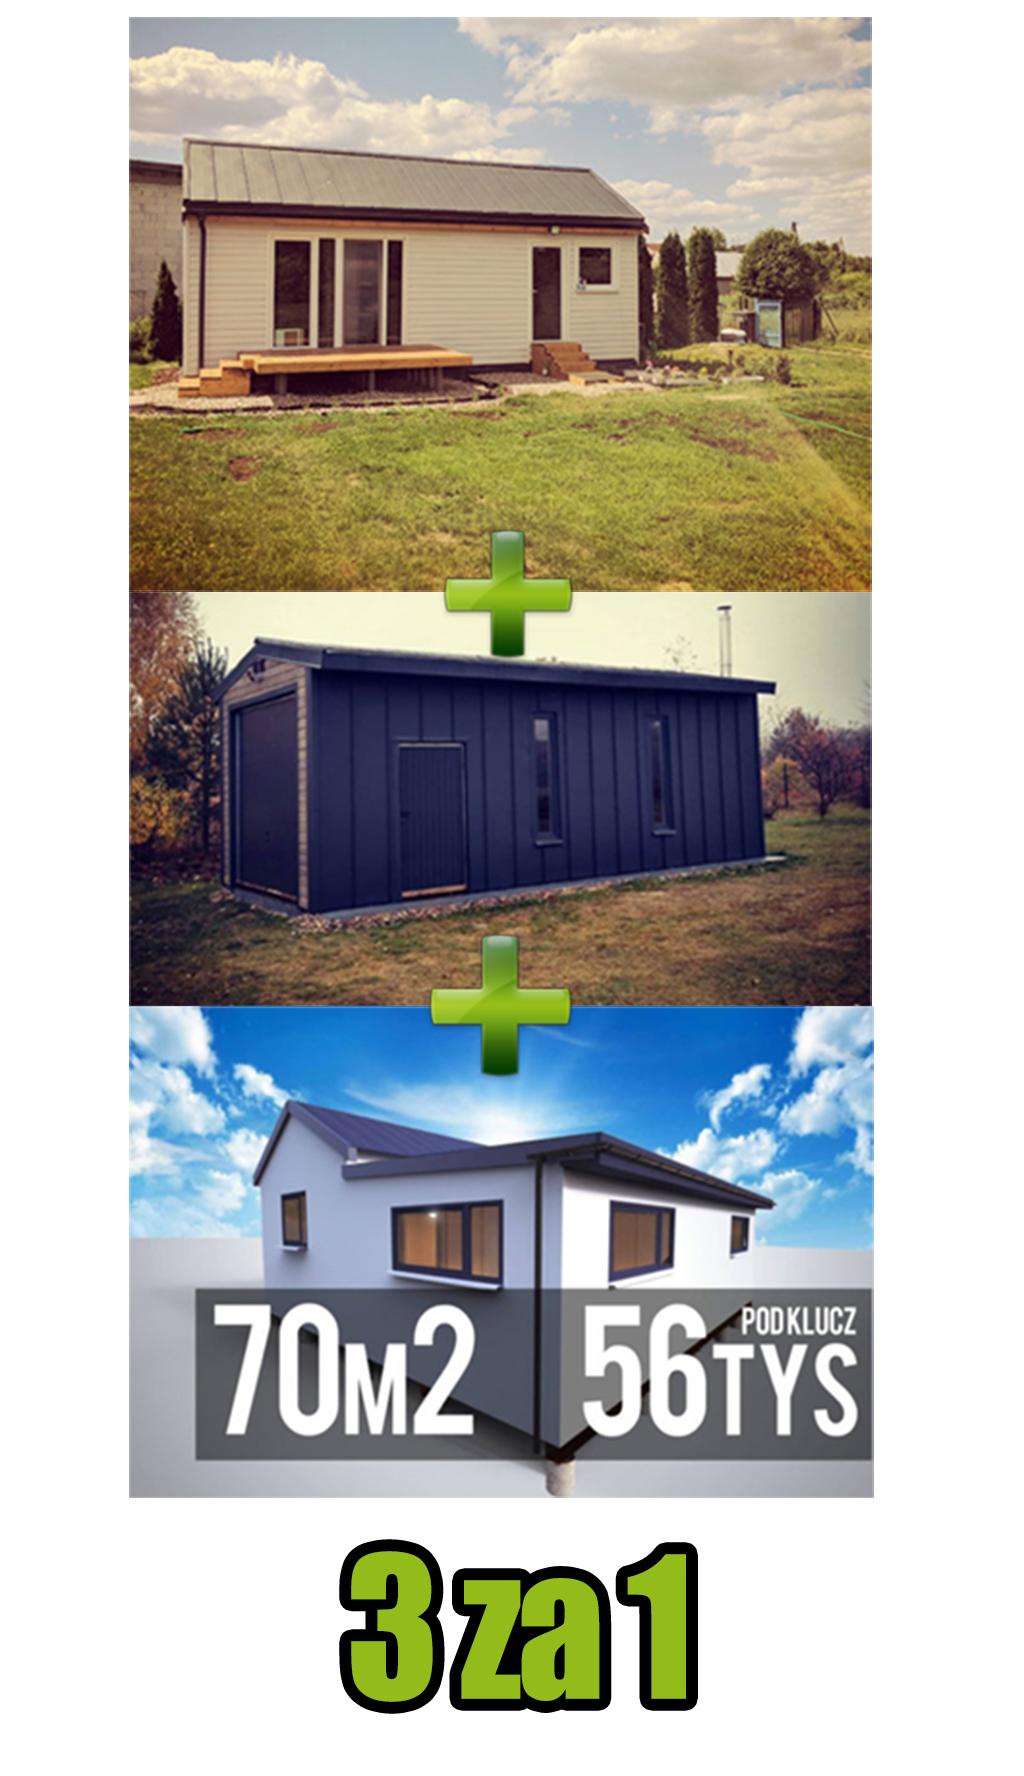 Ostatnie 3 dni promocji, garaż 35m2 i rozbudowa gratis